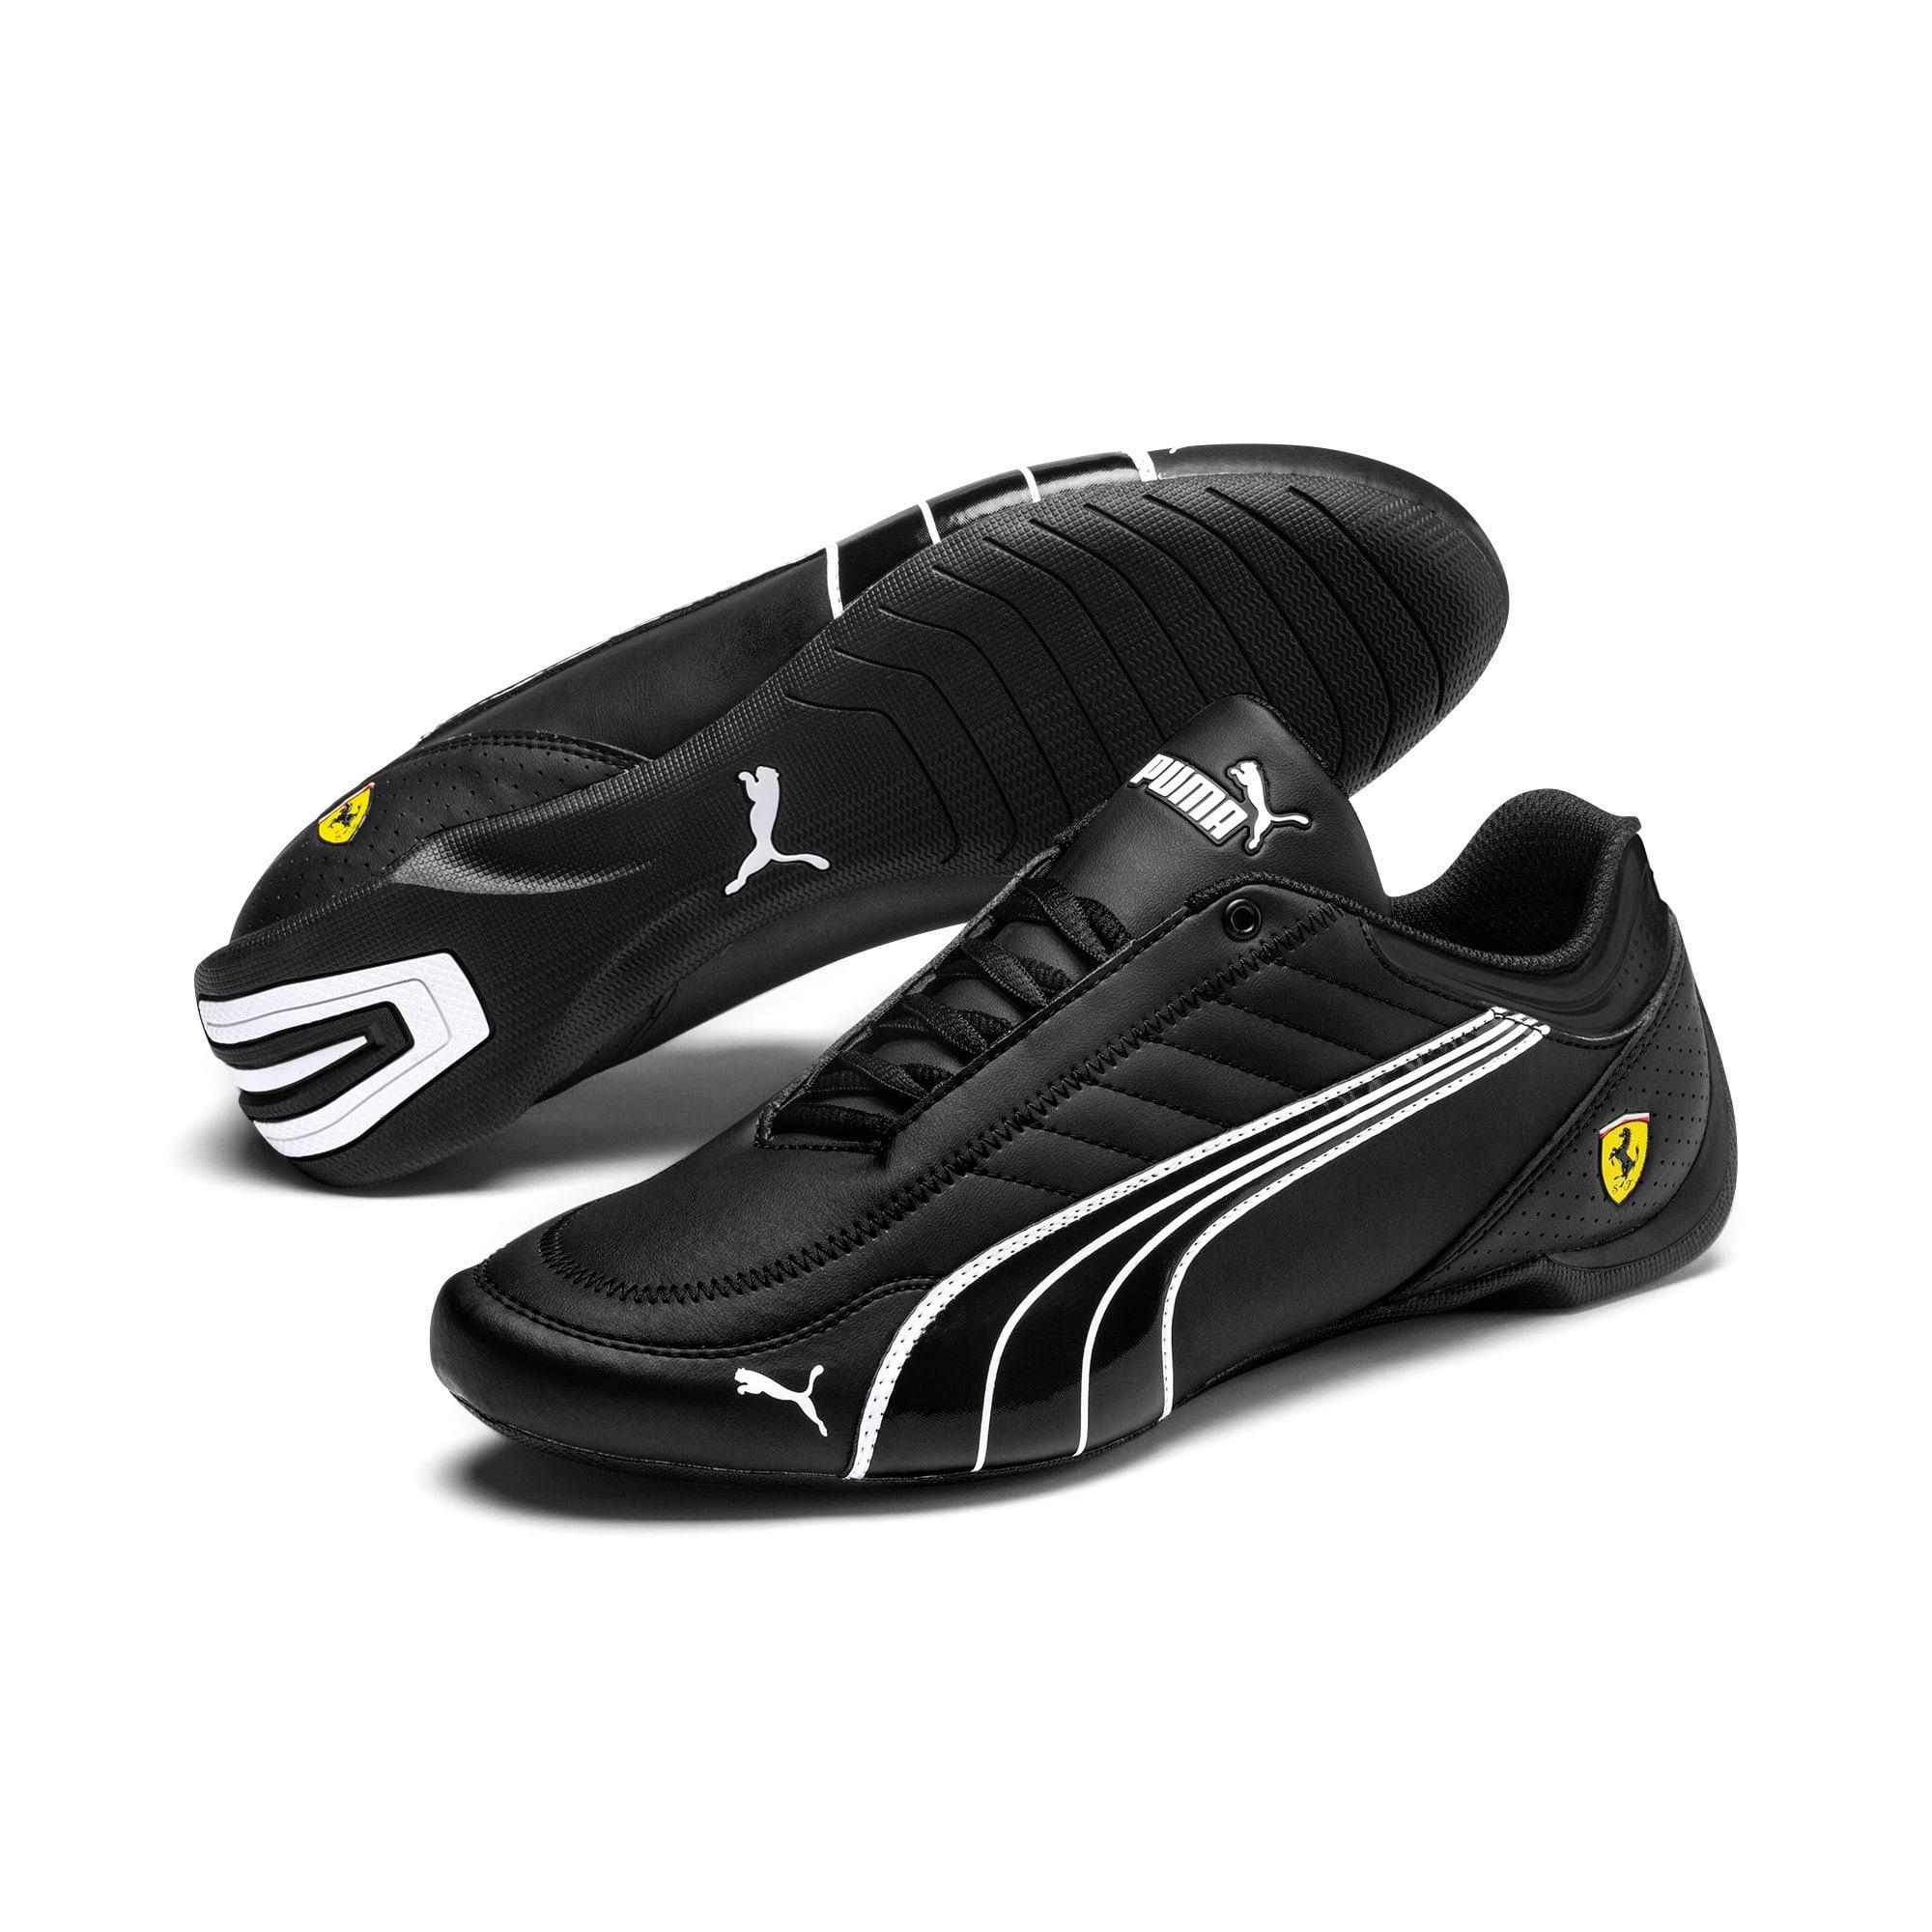 Thumbnail 3 of Scuderia Ferrari Future Kart Cat Shoes, Black-Puma White-Rosso Corsa, medium